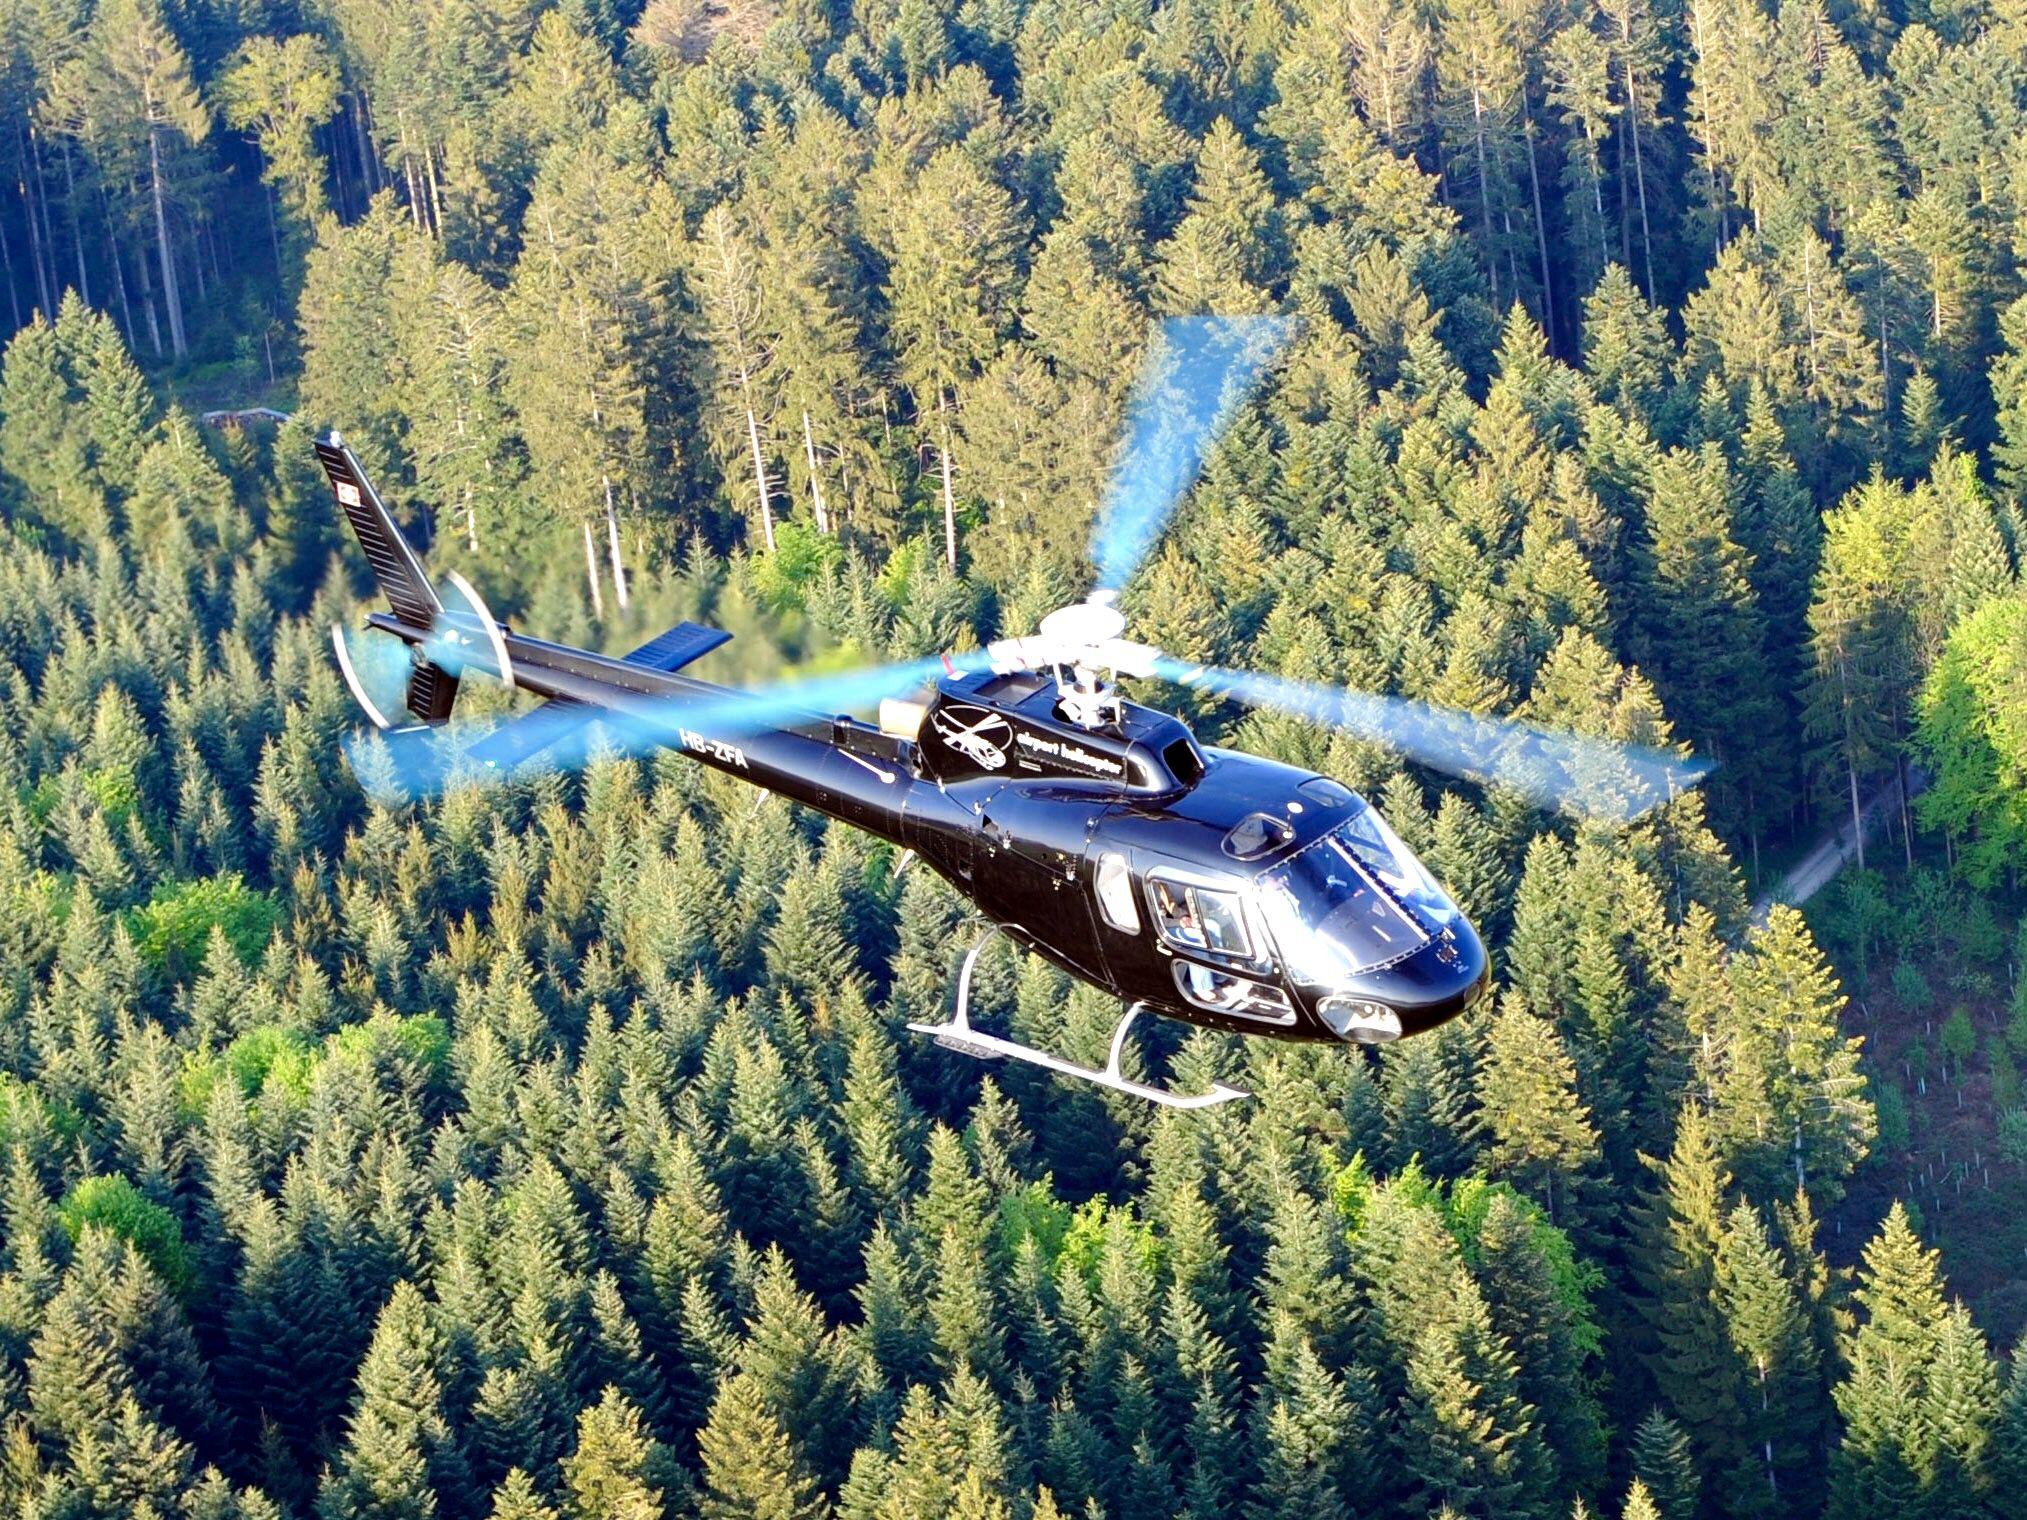 Helikopterflug ab Zürich